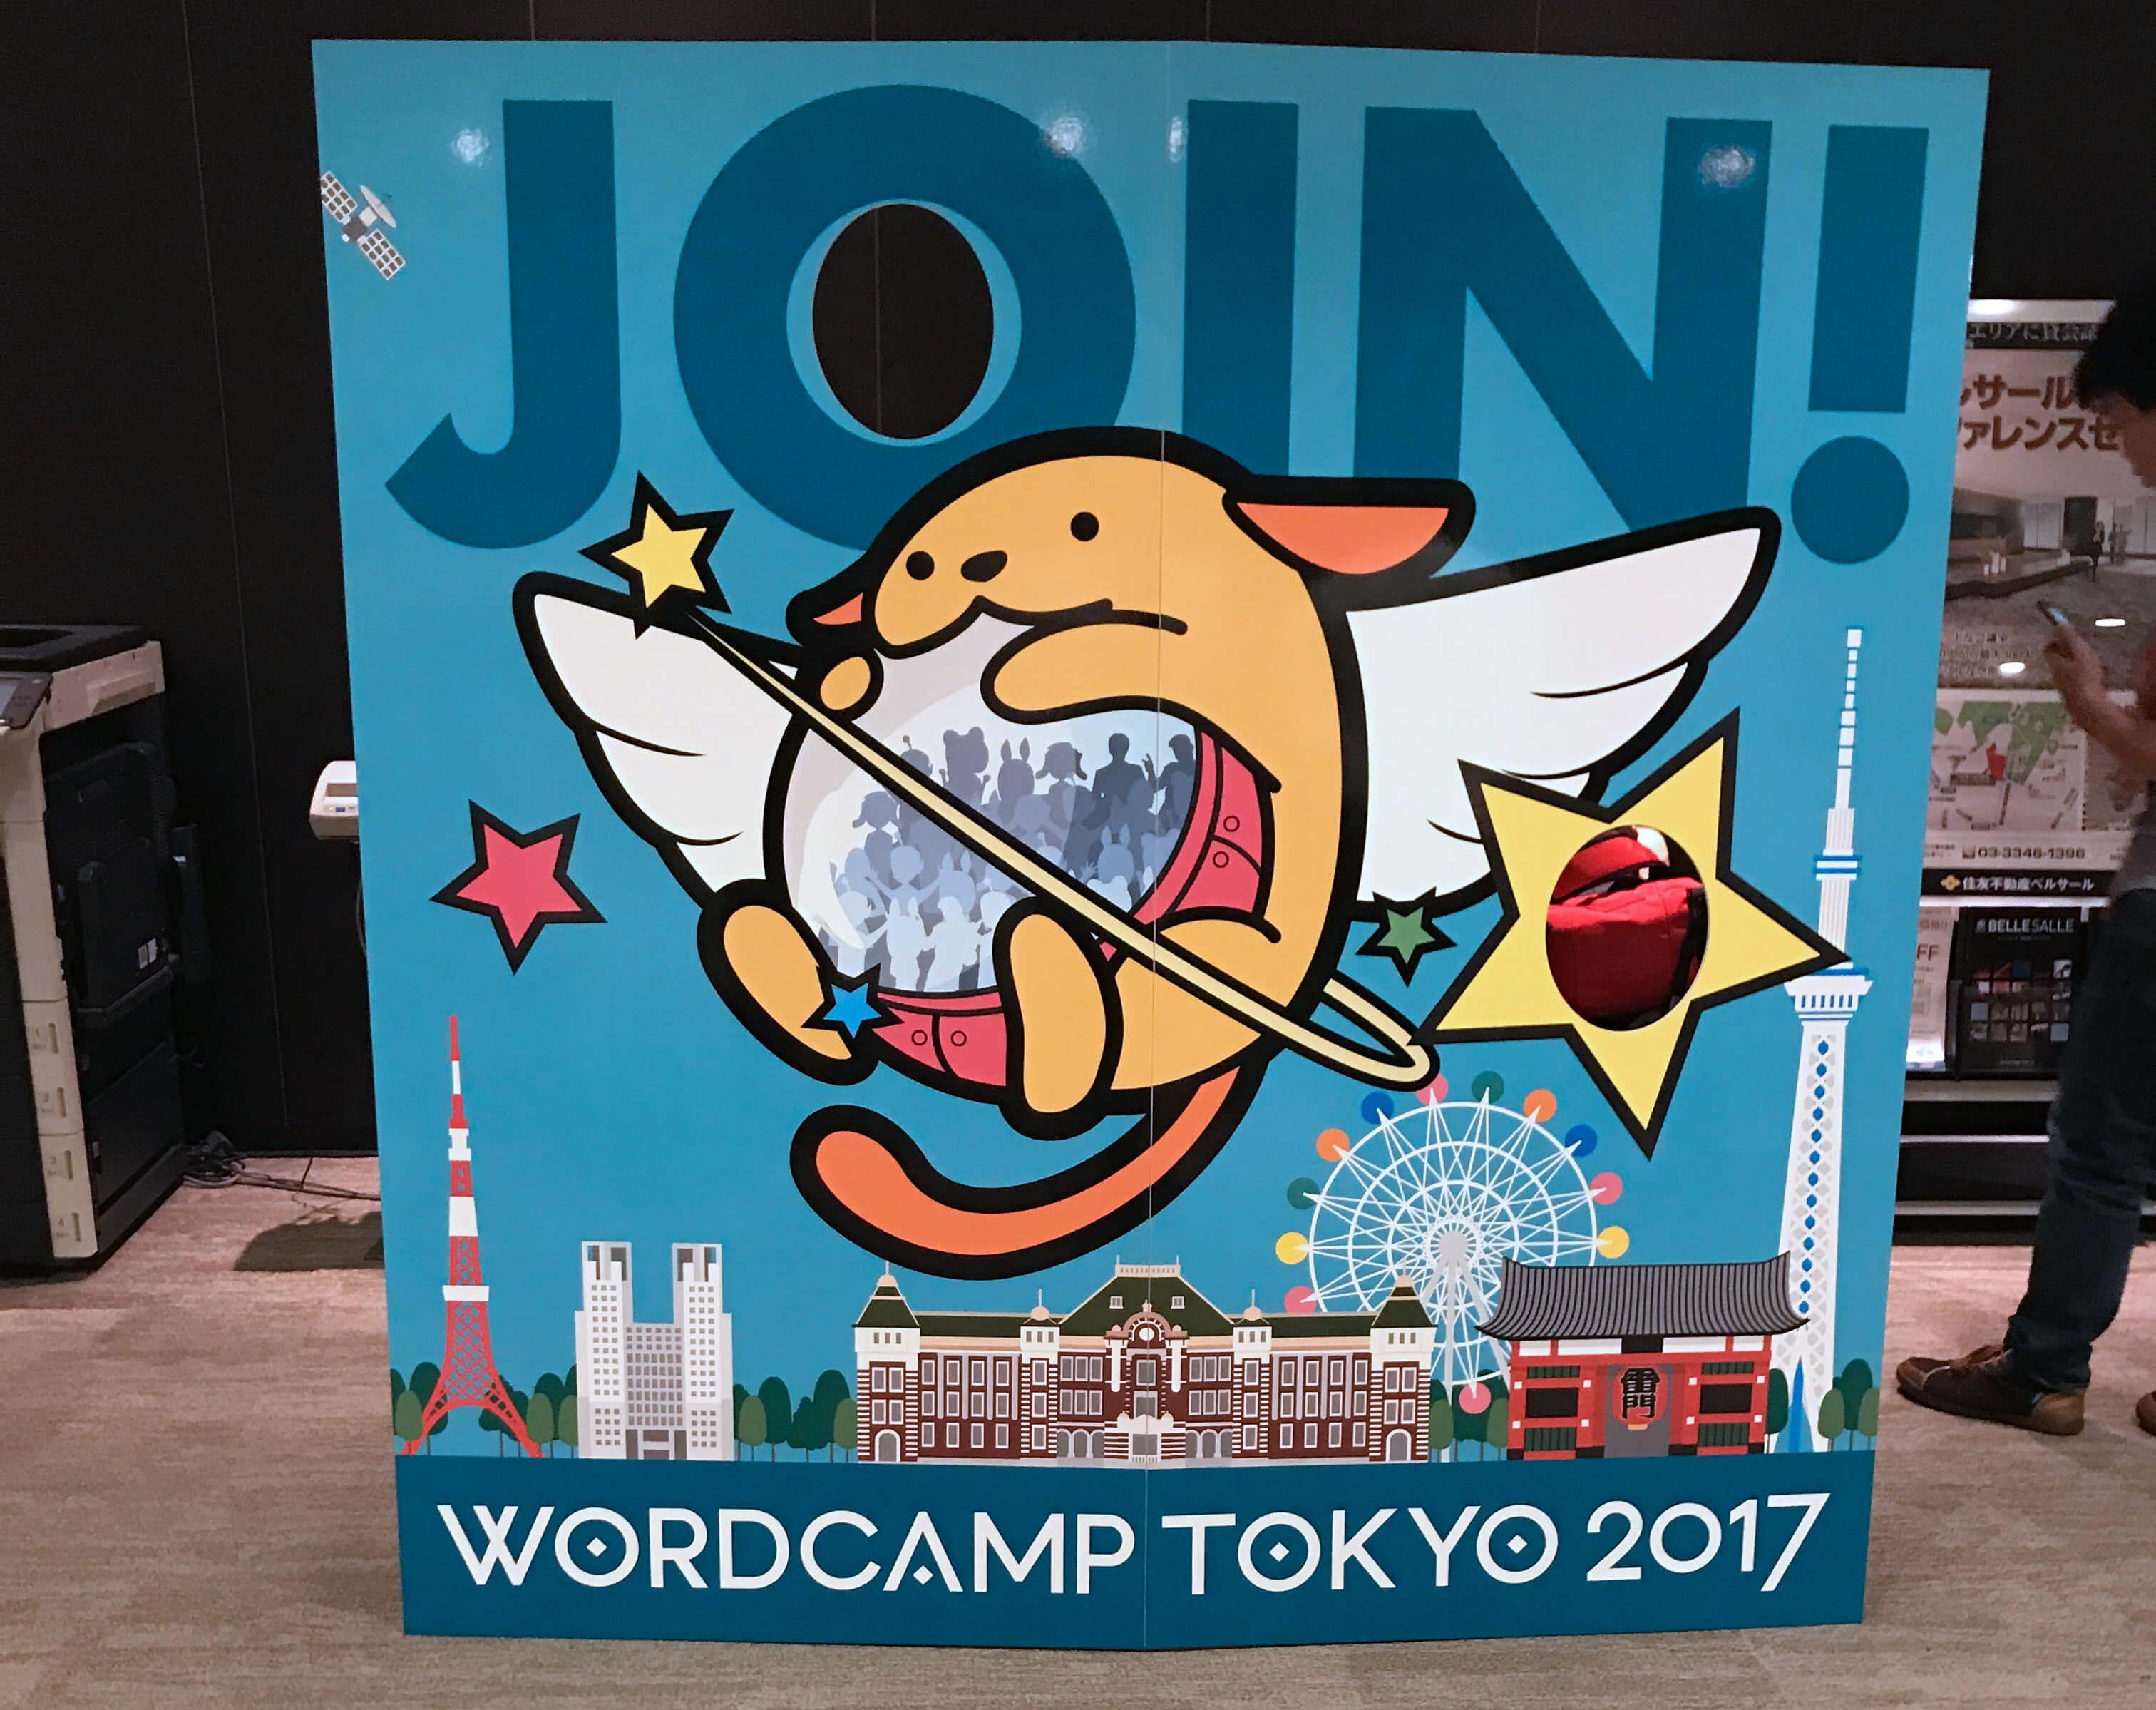 WordCamp Tokyo 2017に参加してきました!〜1日目(セッションデイ)〜